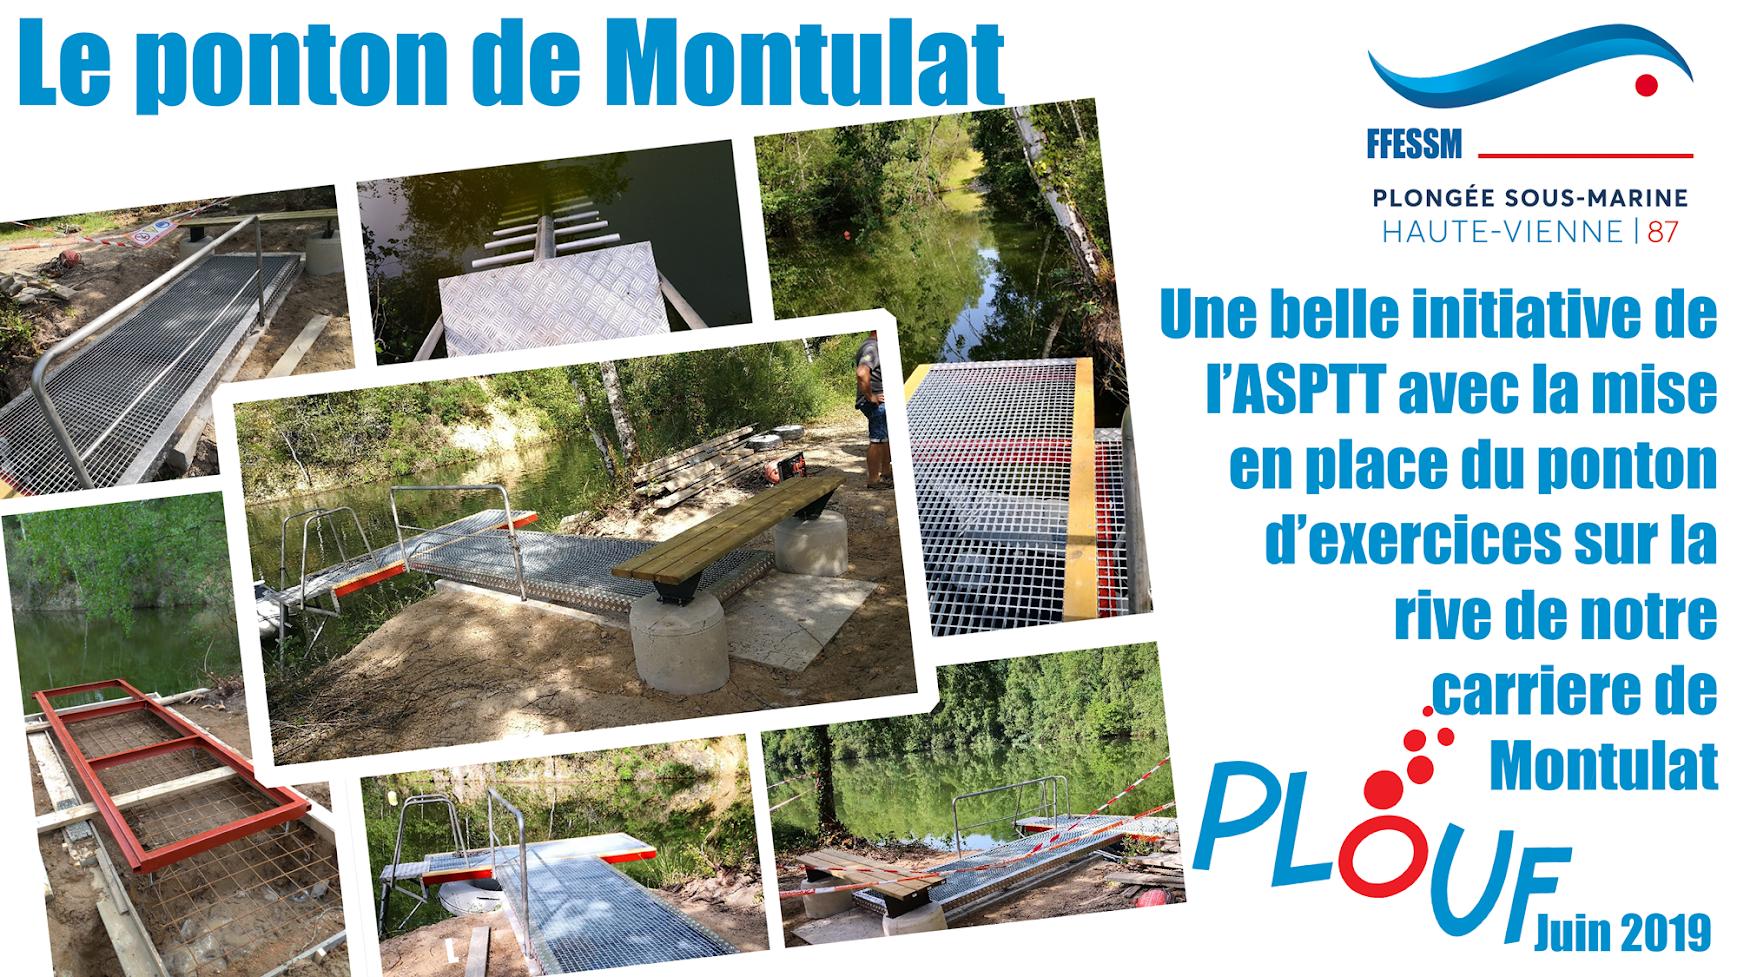 Ponton Montula